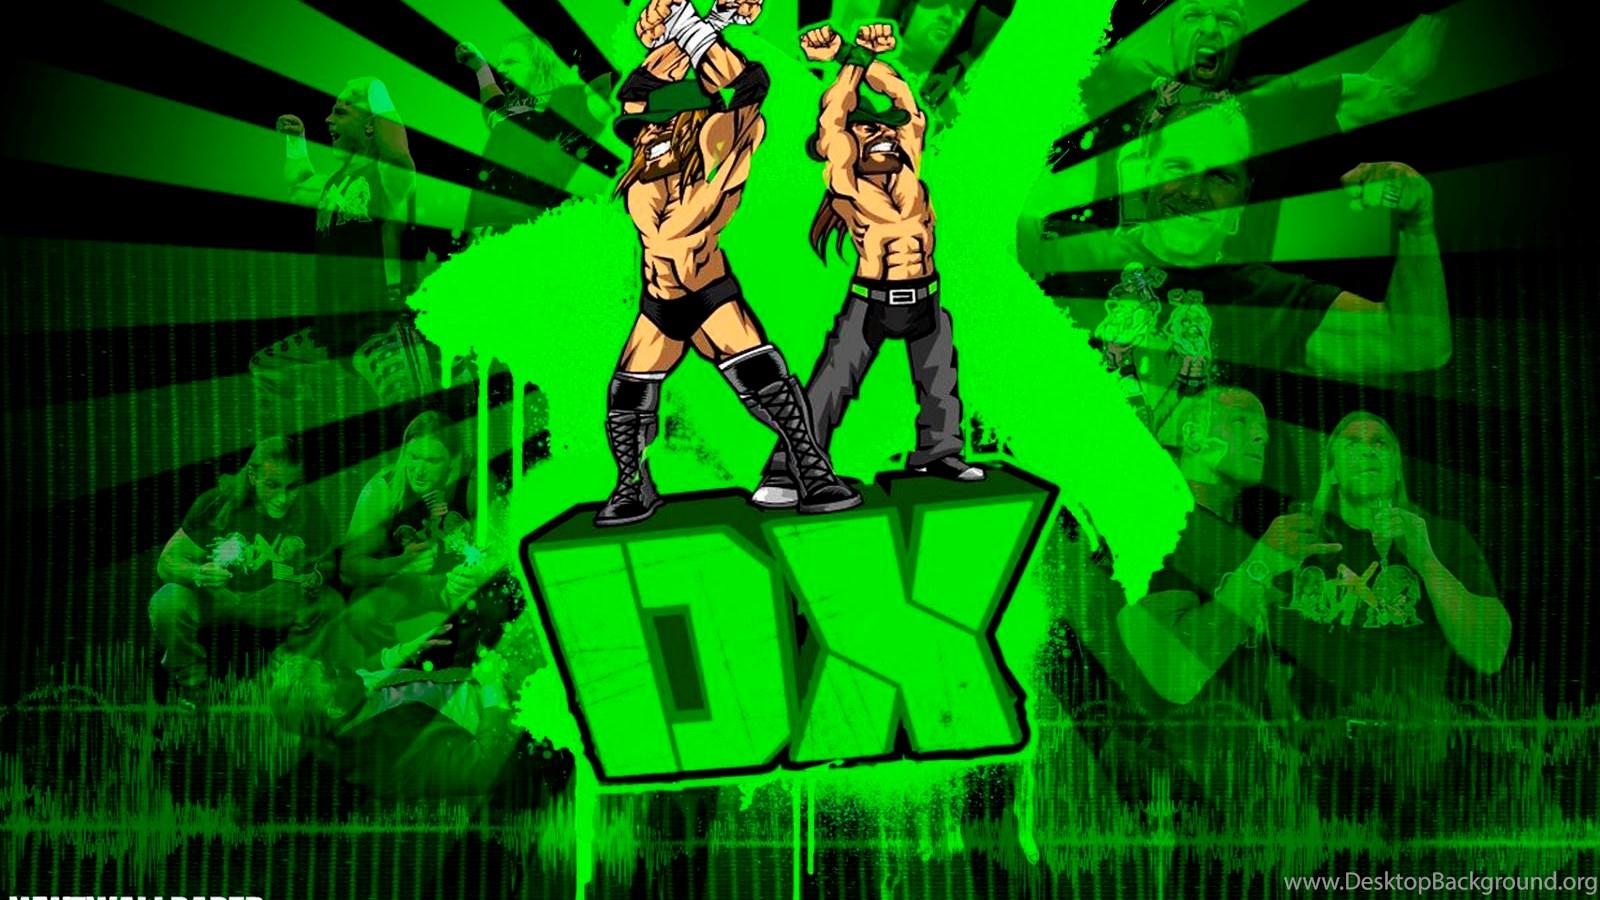 Wwe Dx Wallpapers Download Desktop Background